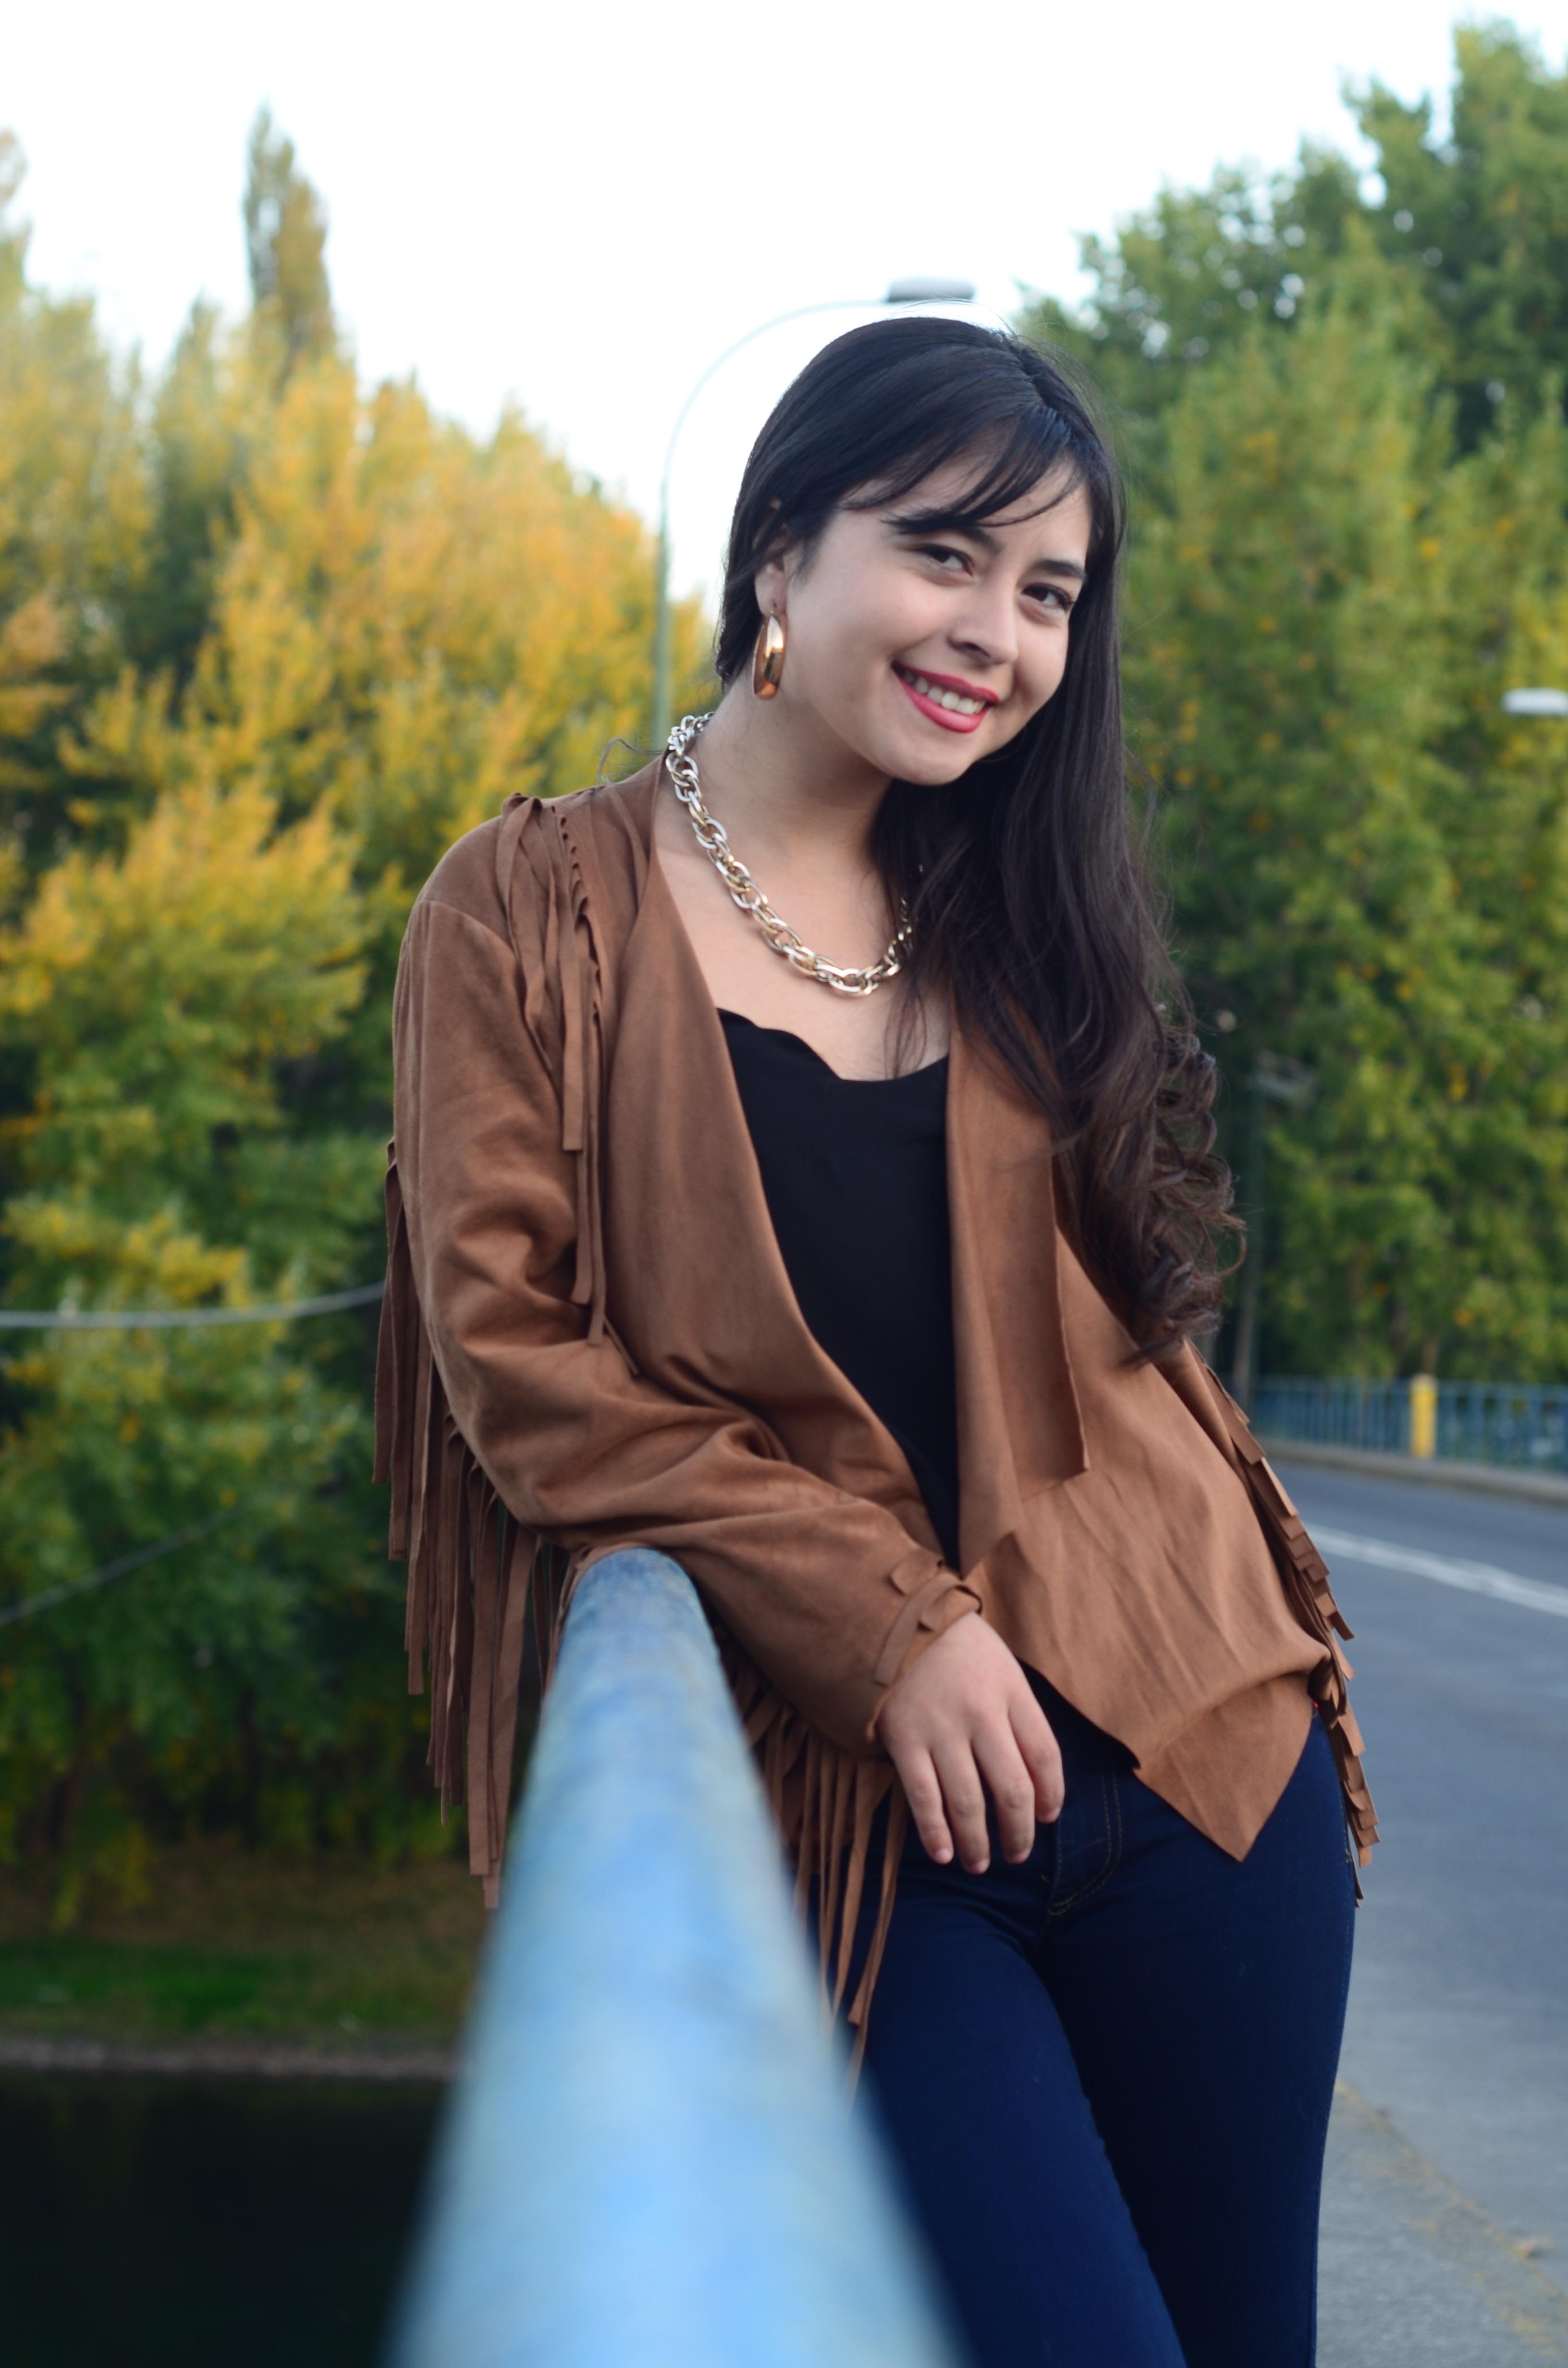 Modelo Gratis Fotografía Niña Primavera Moda Mujer Fotos wTSqnId